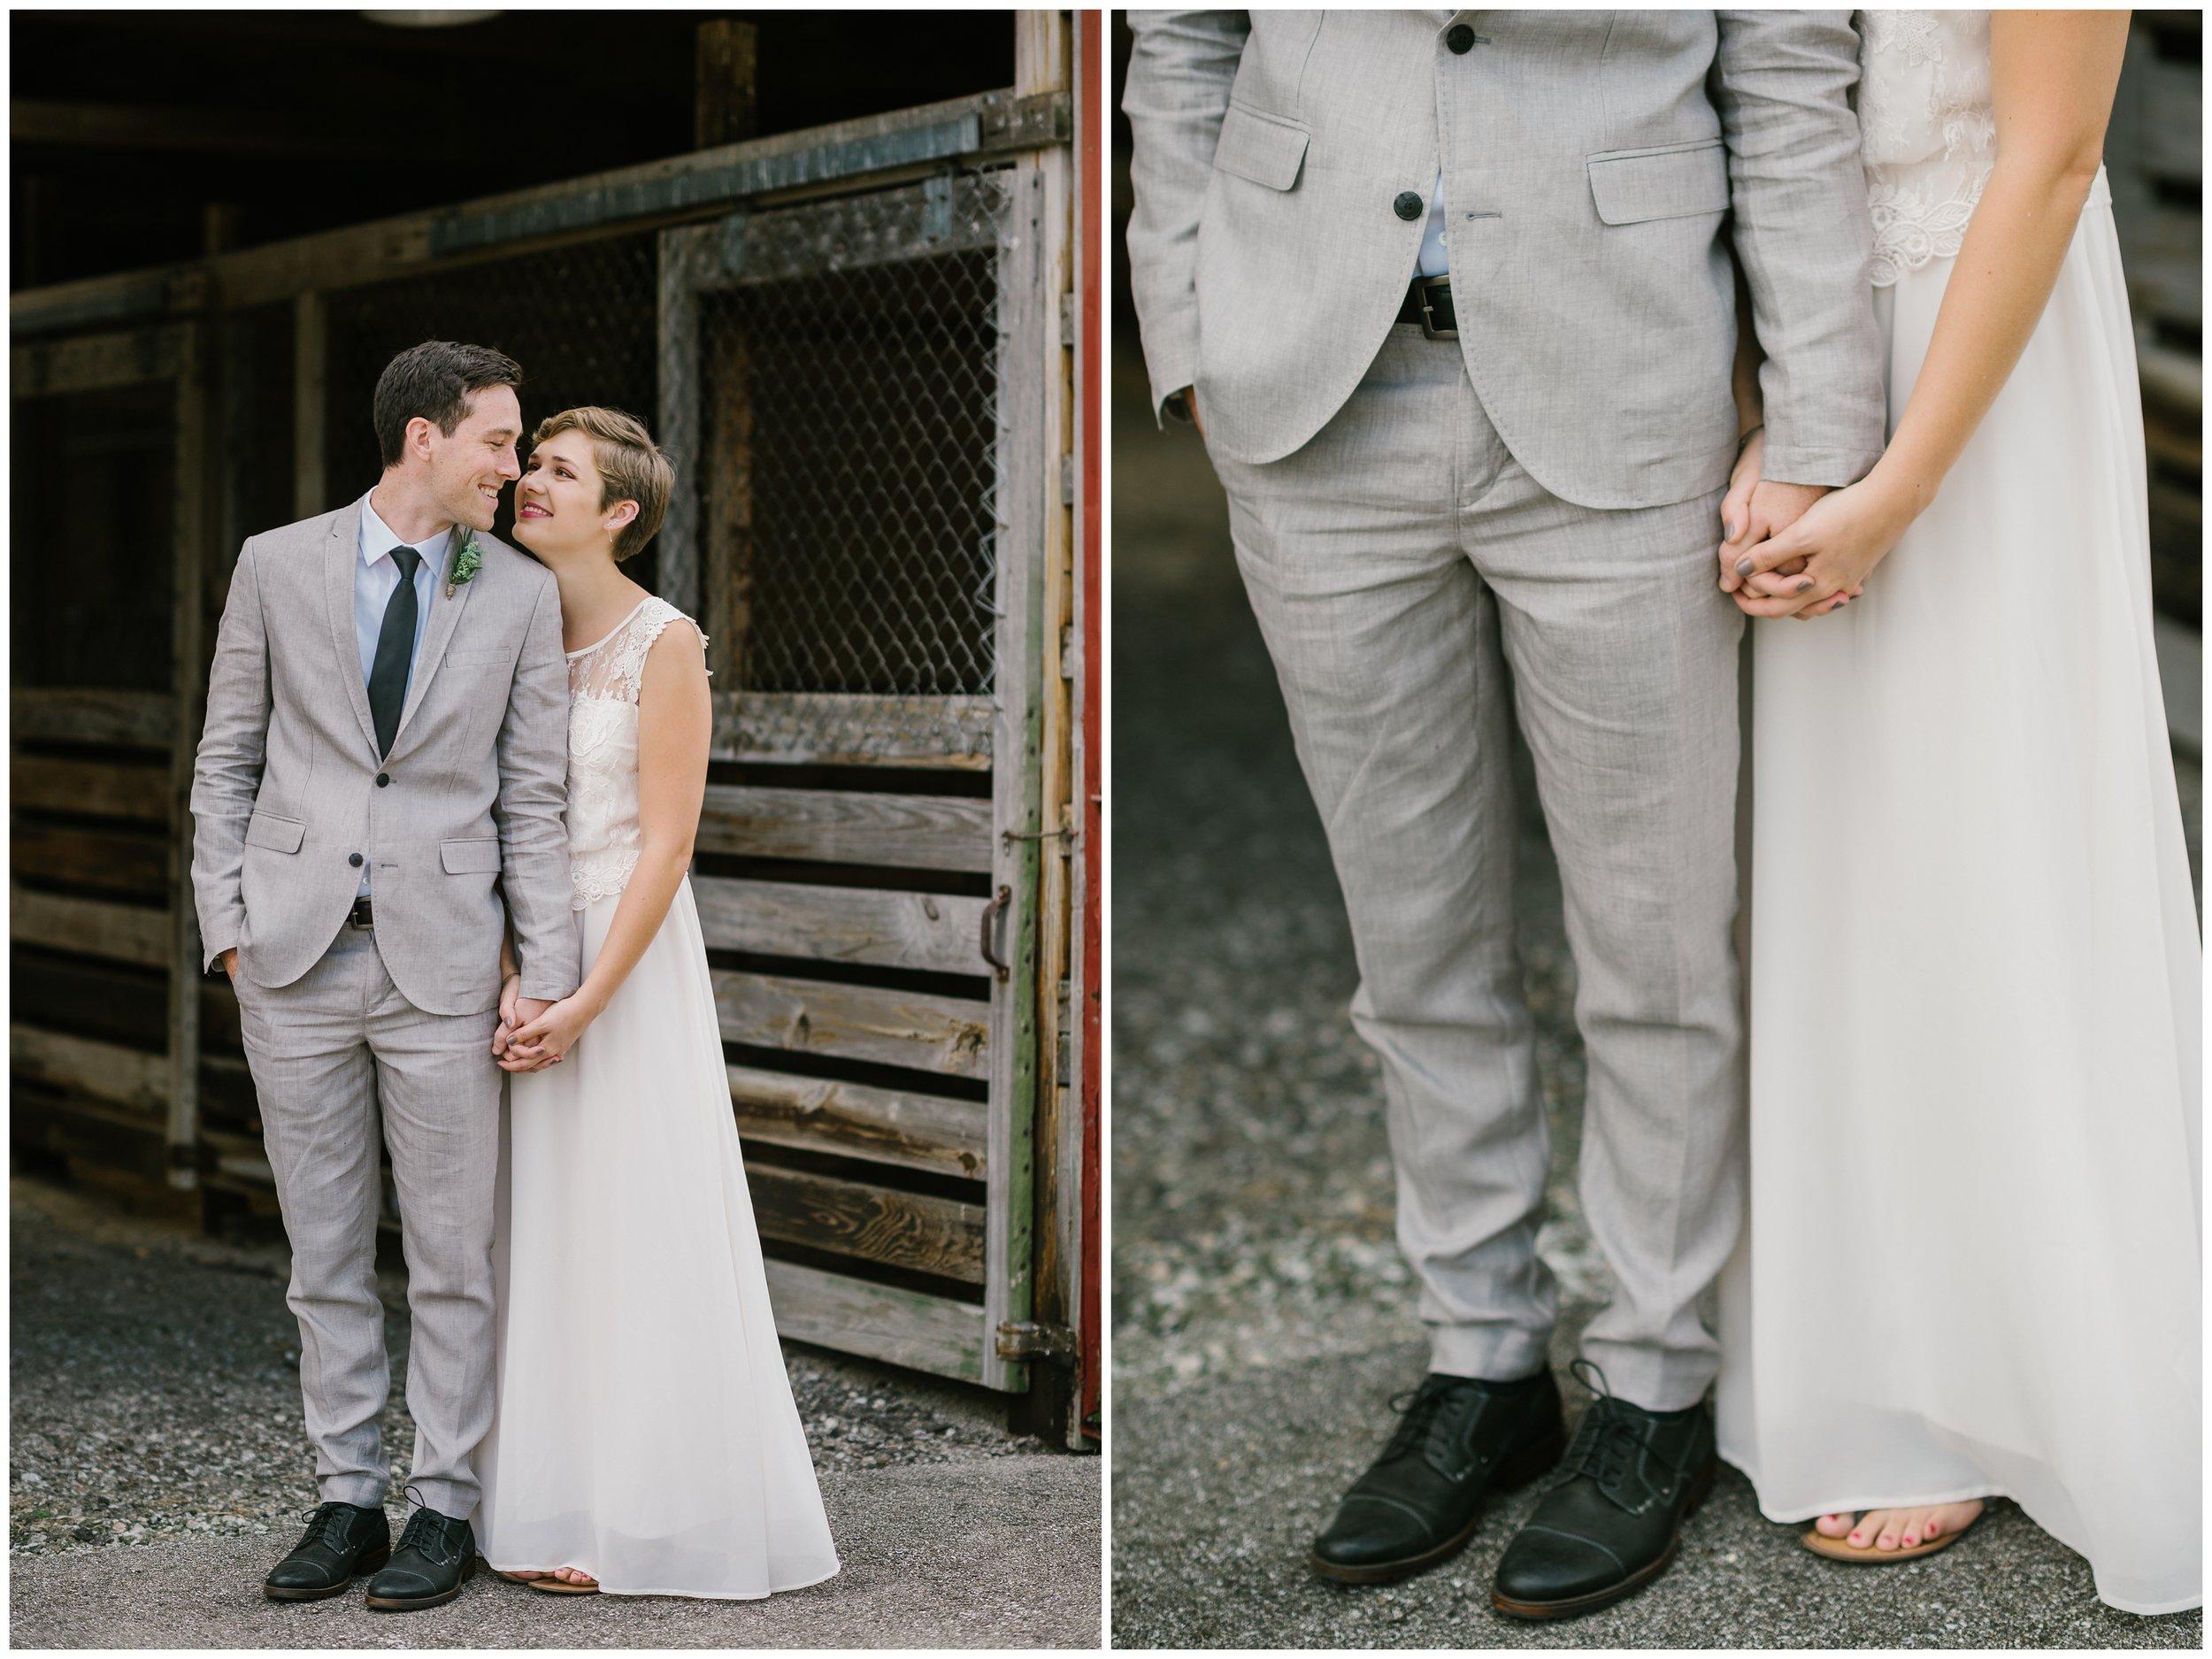 Rebecca_Shehorn_Photography_Indianapolis_Wedding_Photographer_7225.jpg